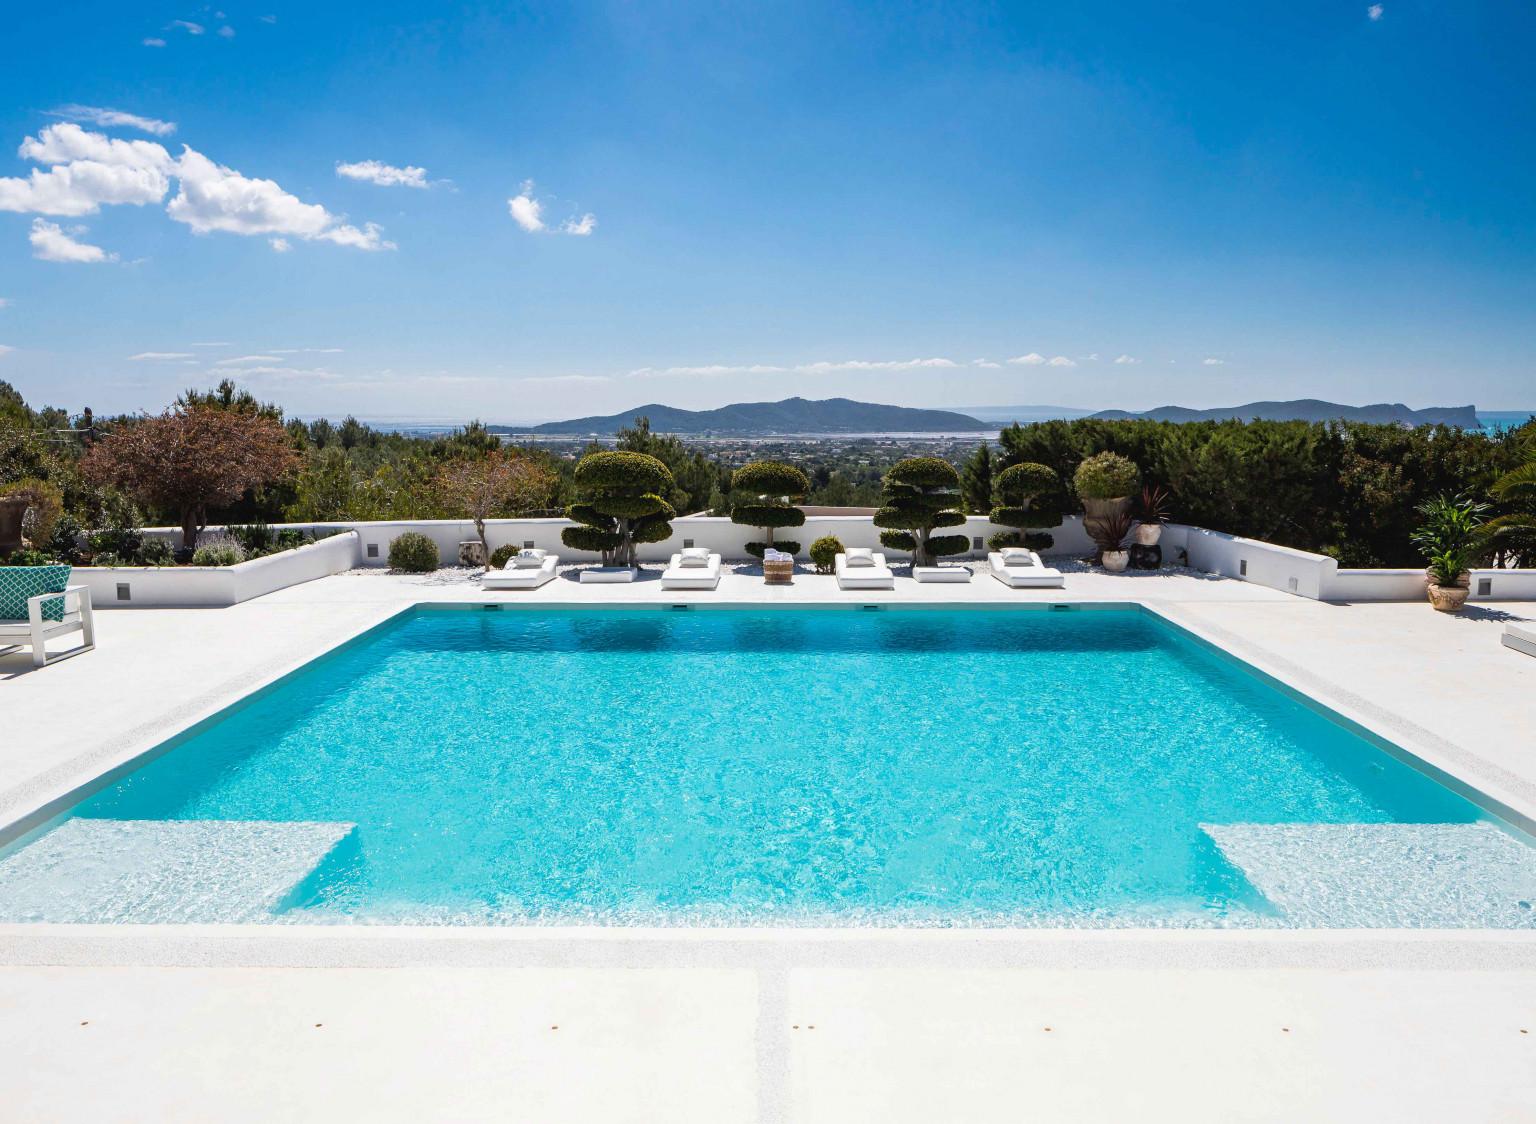 Luxury Villa Holidays & Private Villa Rentals | Mr & Mrs Smith